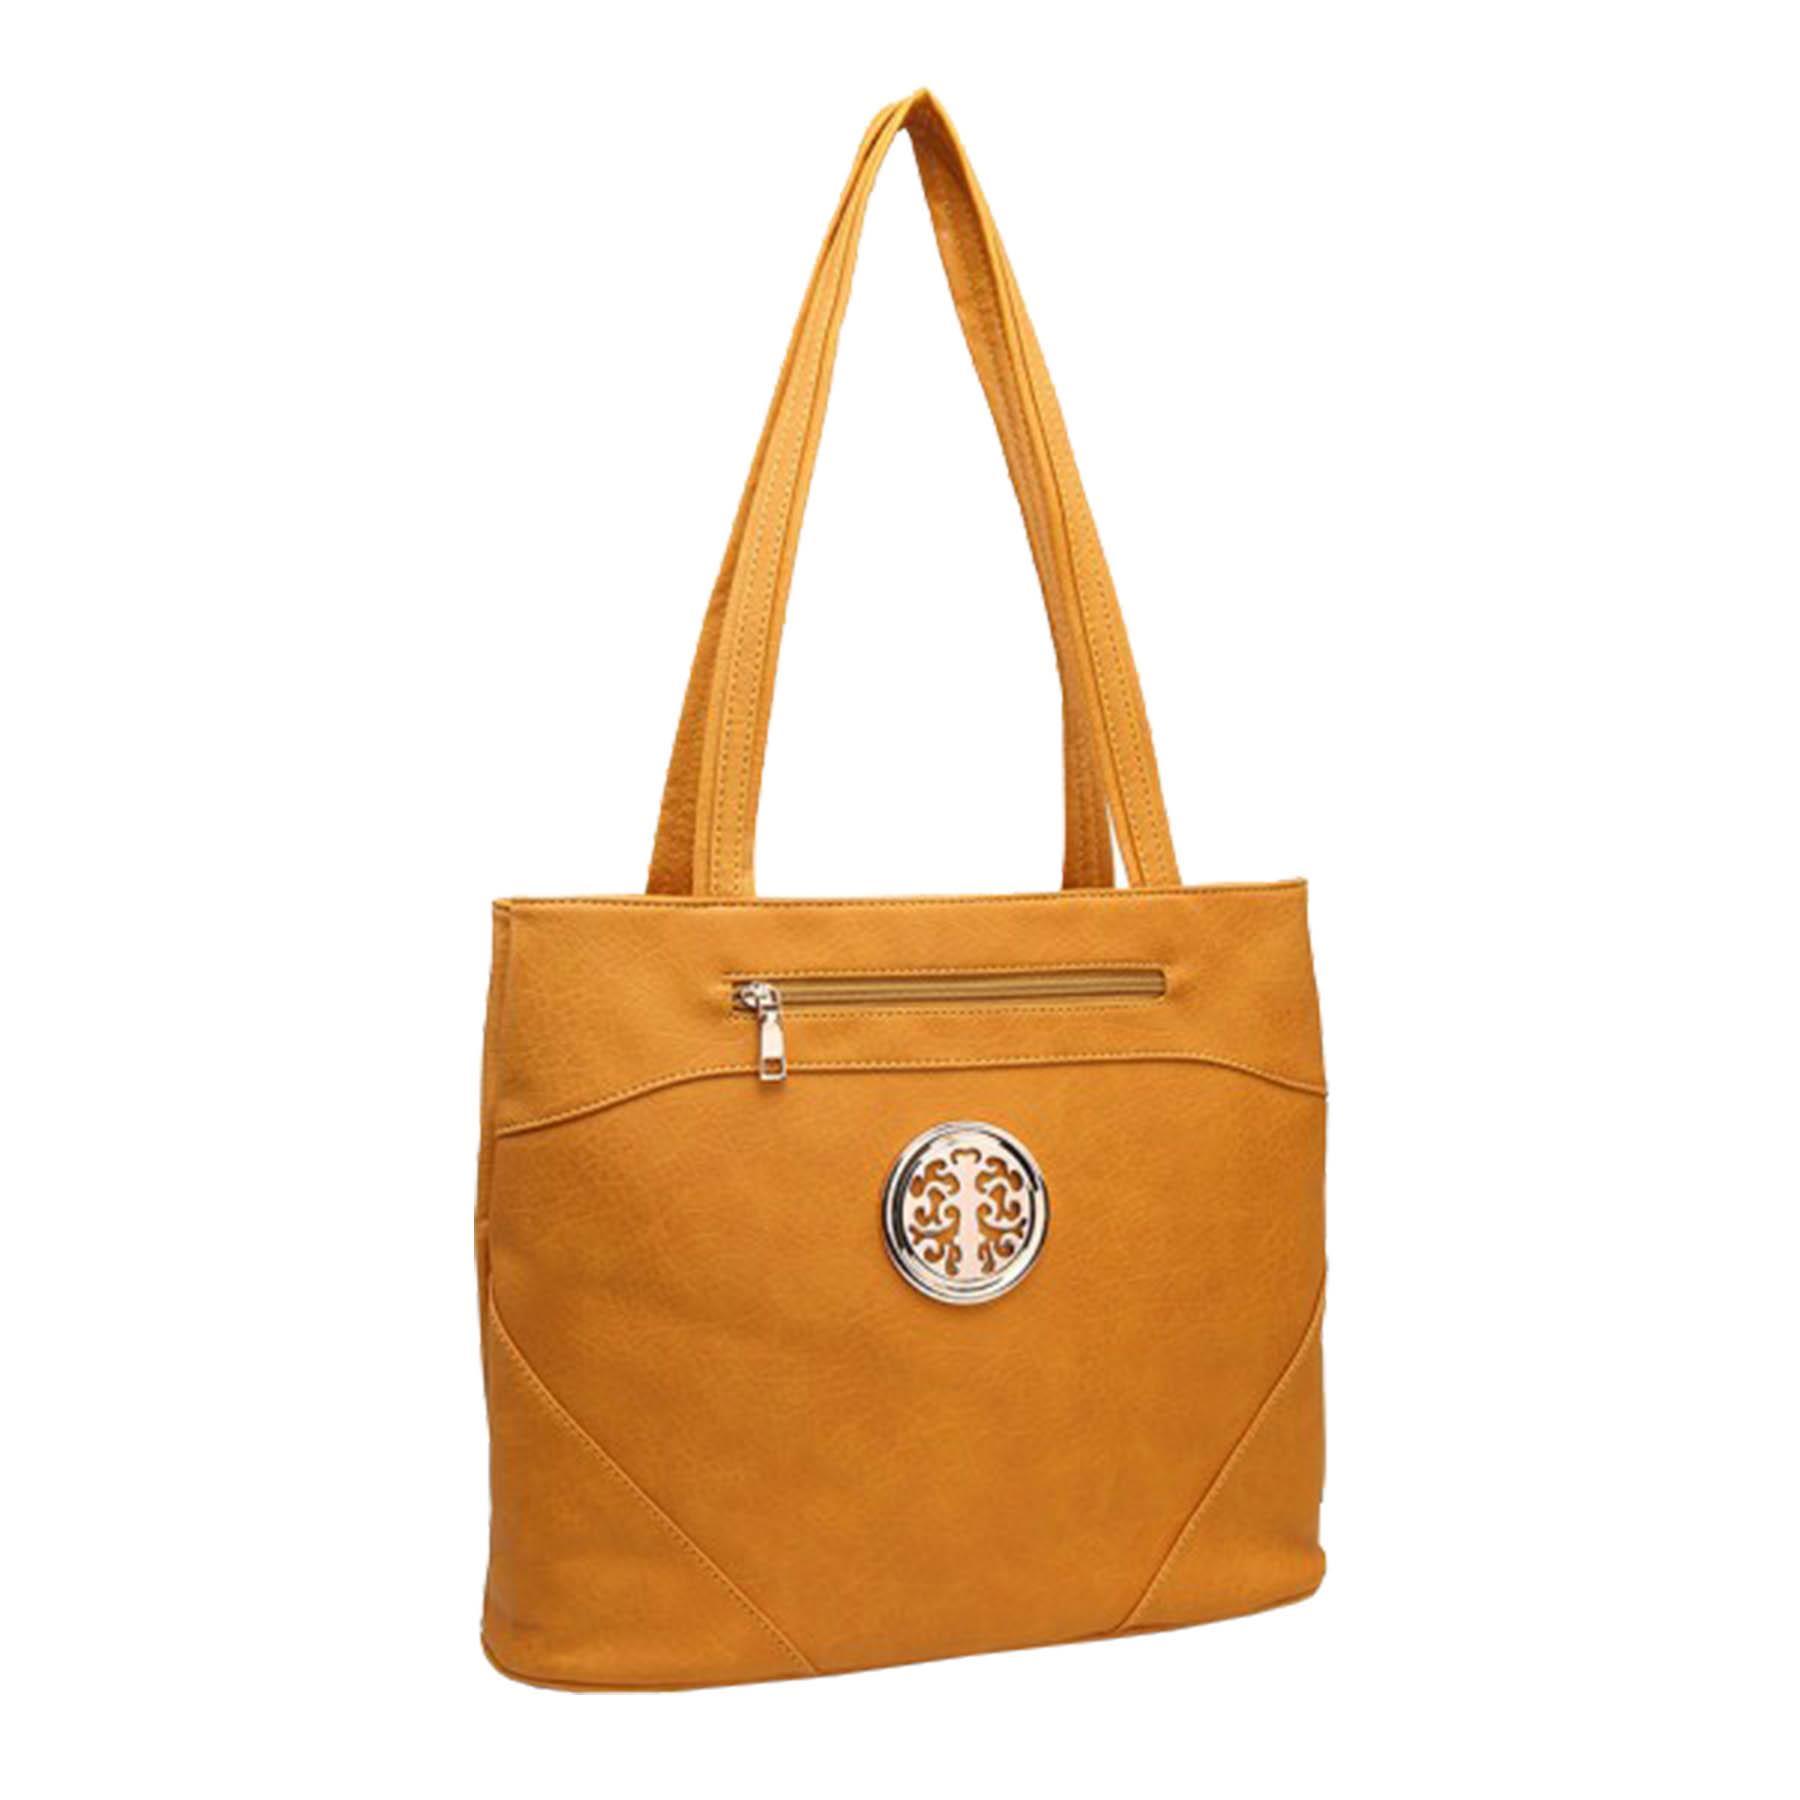 New-Casual-Ladies-Work-Double-Compartment-Metallic-Detail-Shoulder-Bag thumbnail 8